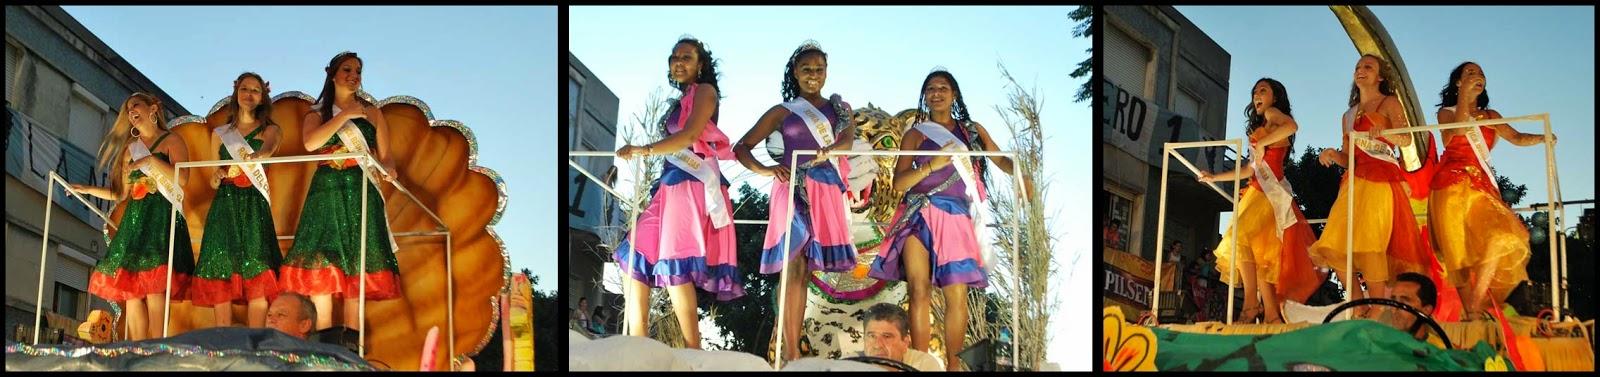 Desfile de Llamadas.Reinas. Montevideo. 2011.